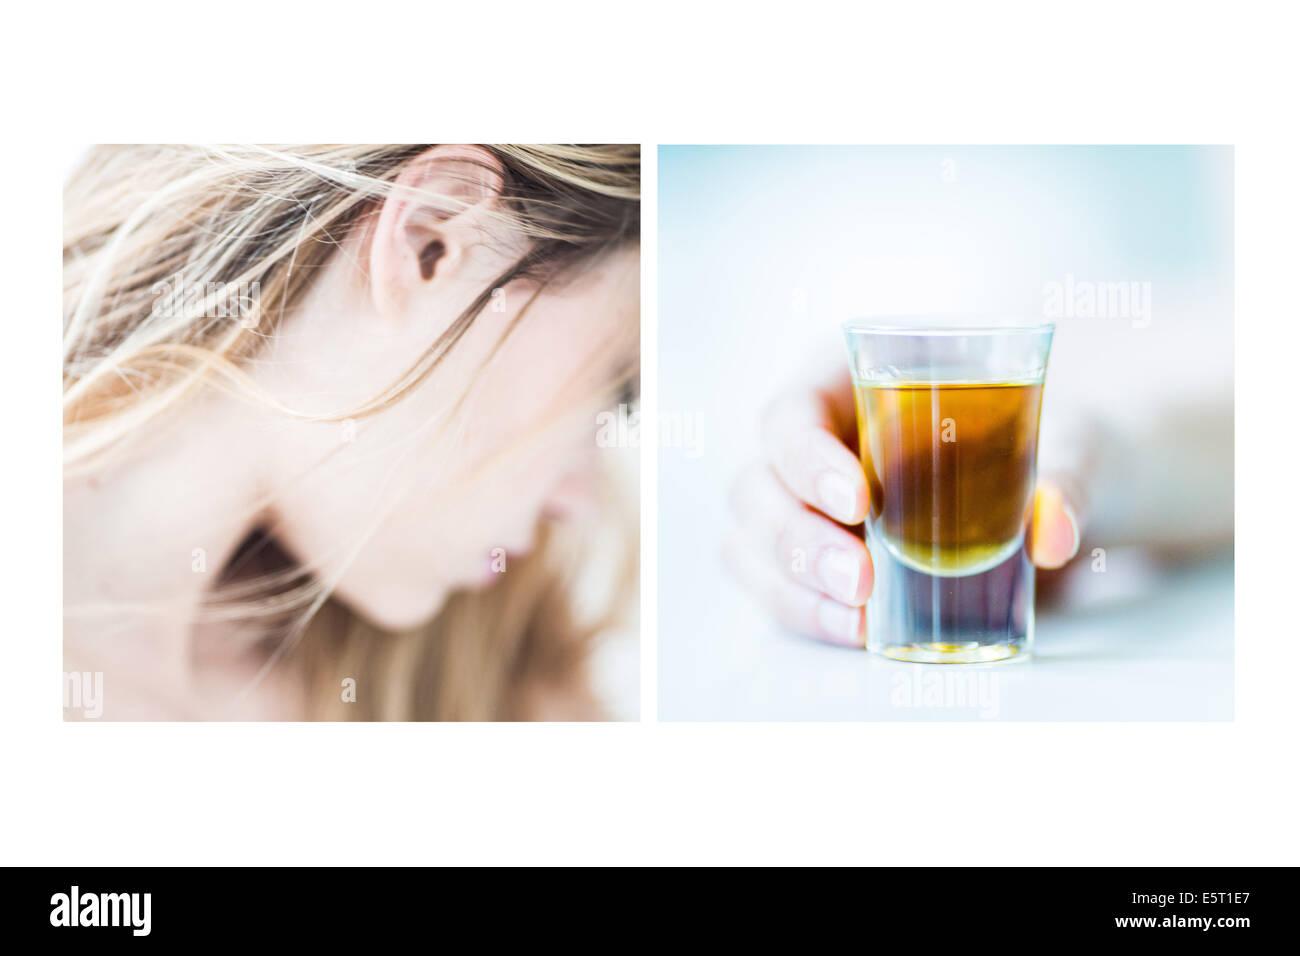 Konzept des Weibes Alkoholismus. Stockbild